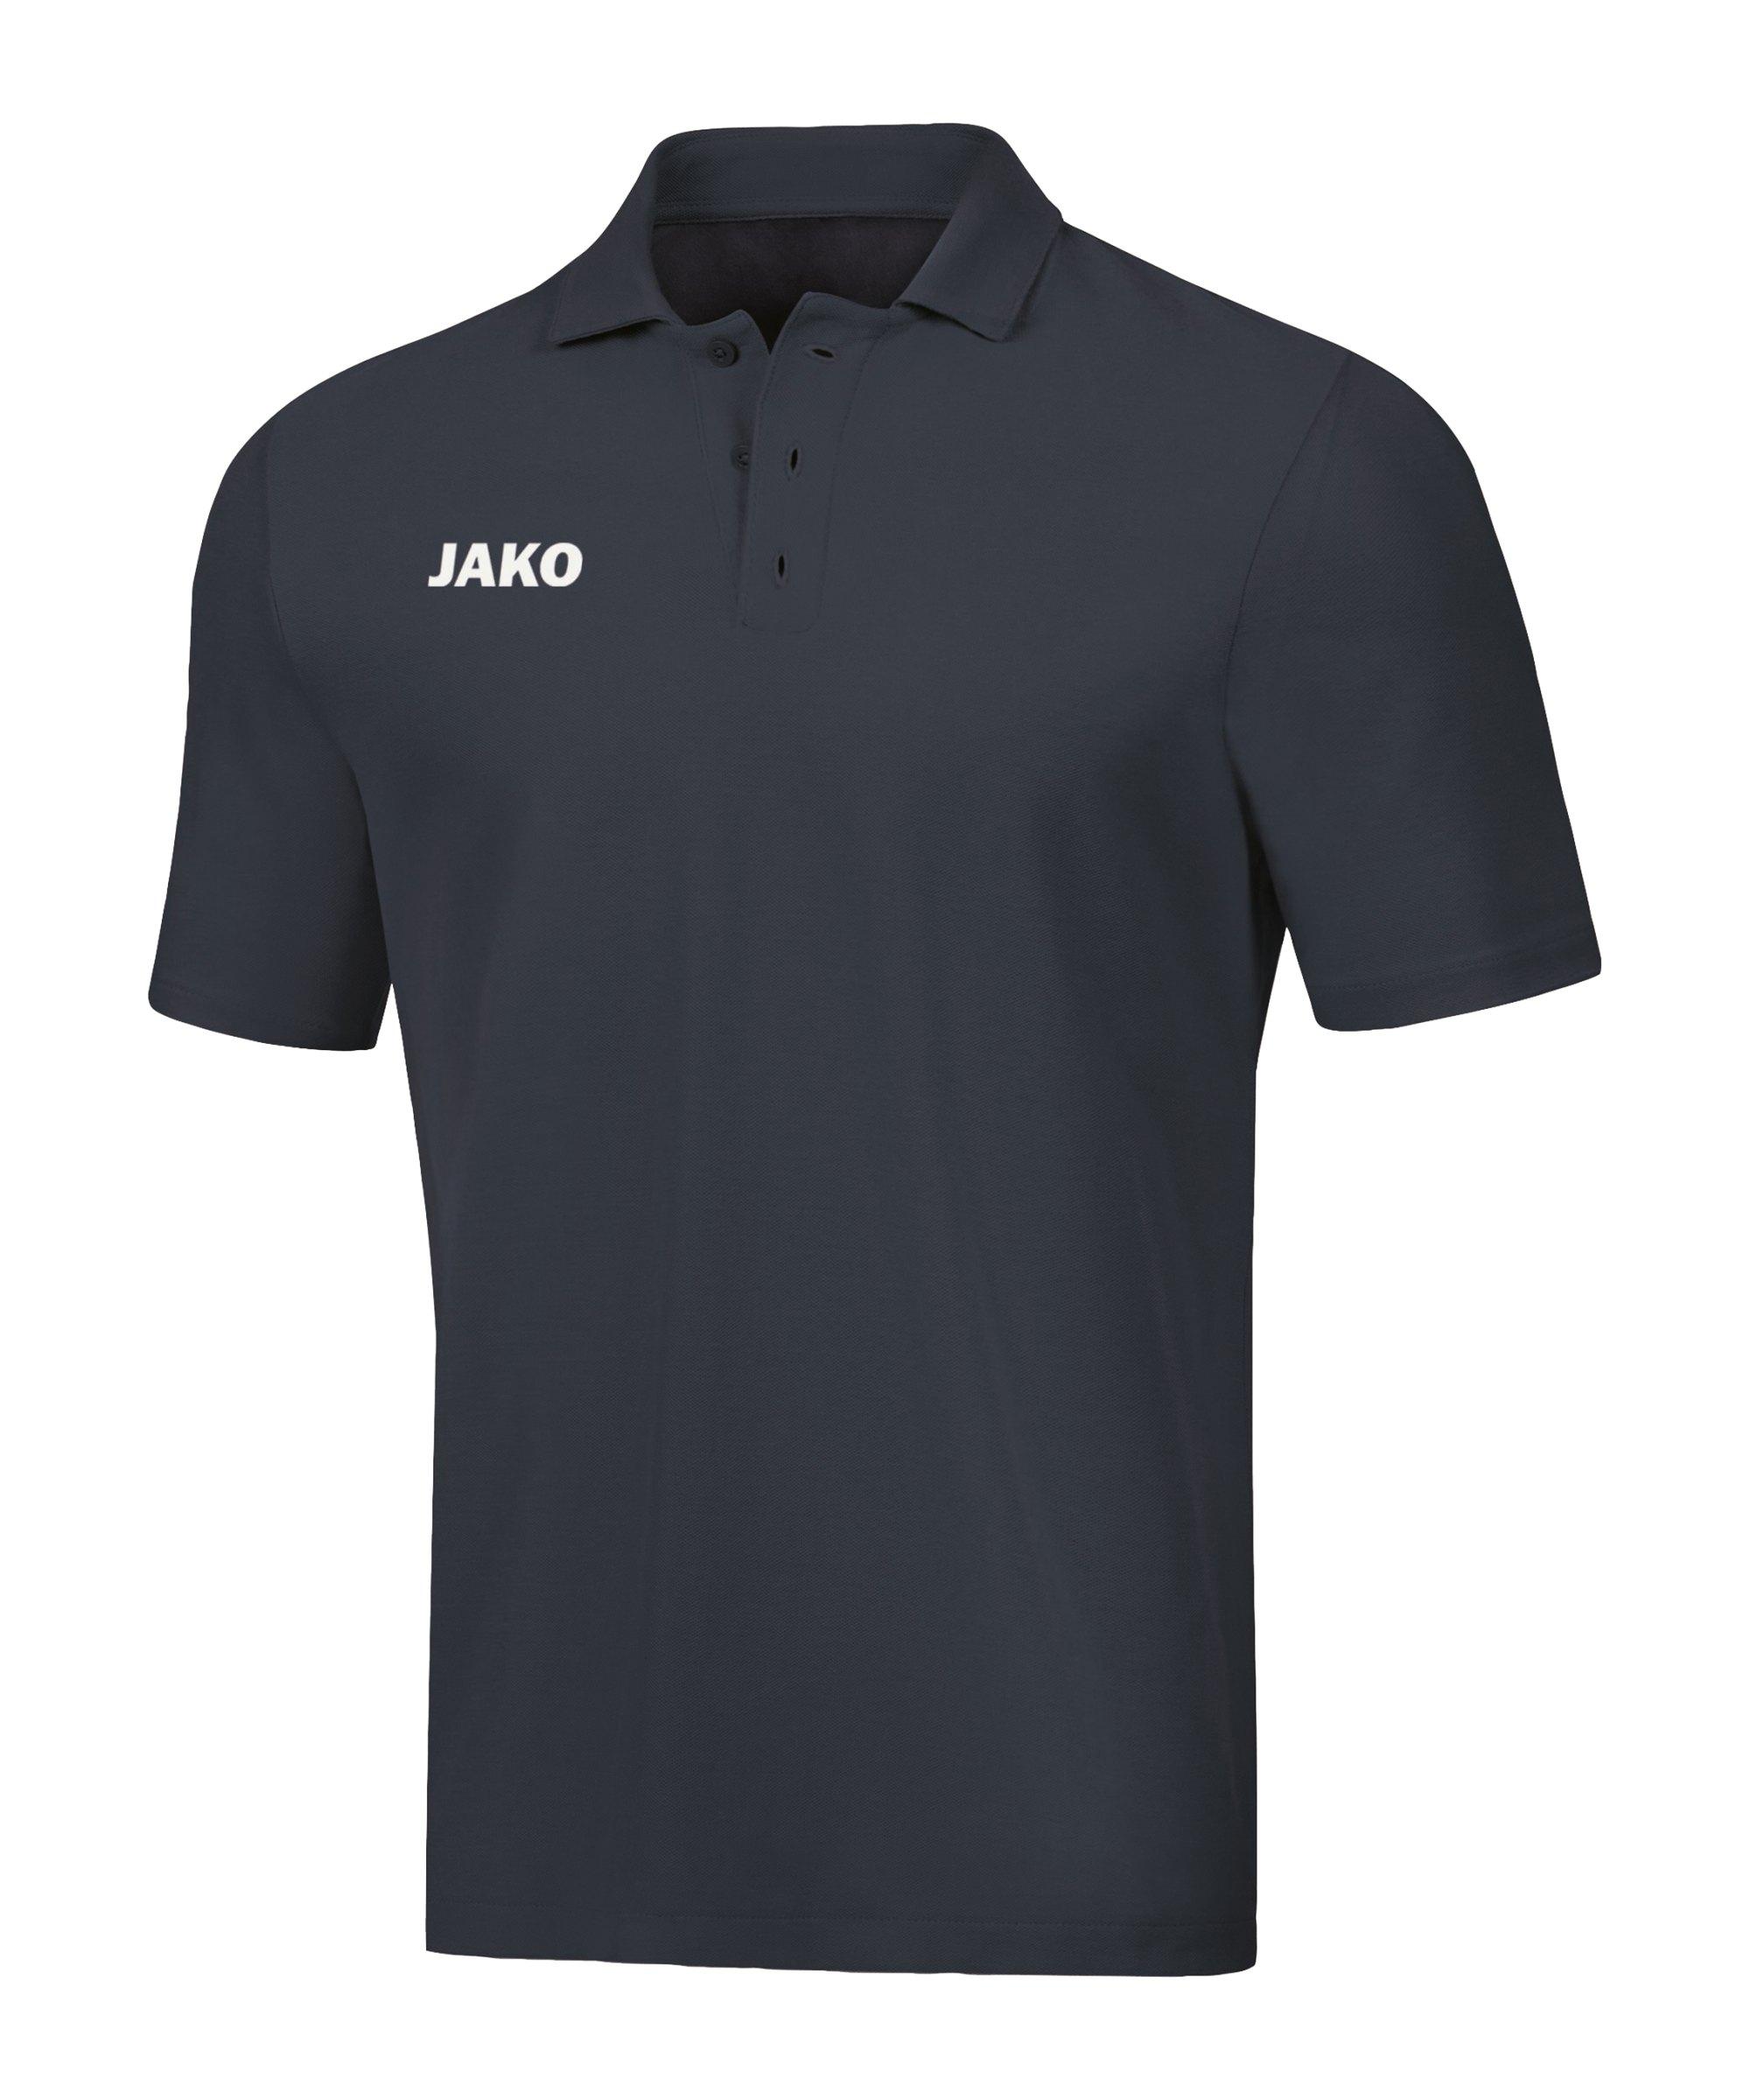 JAKO Base Poloshirt Grau F21 - grau